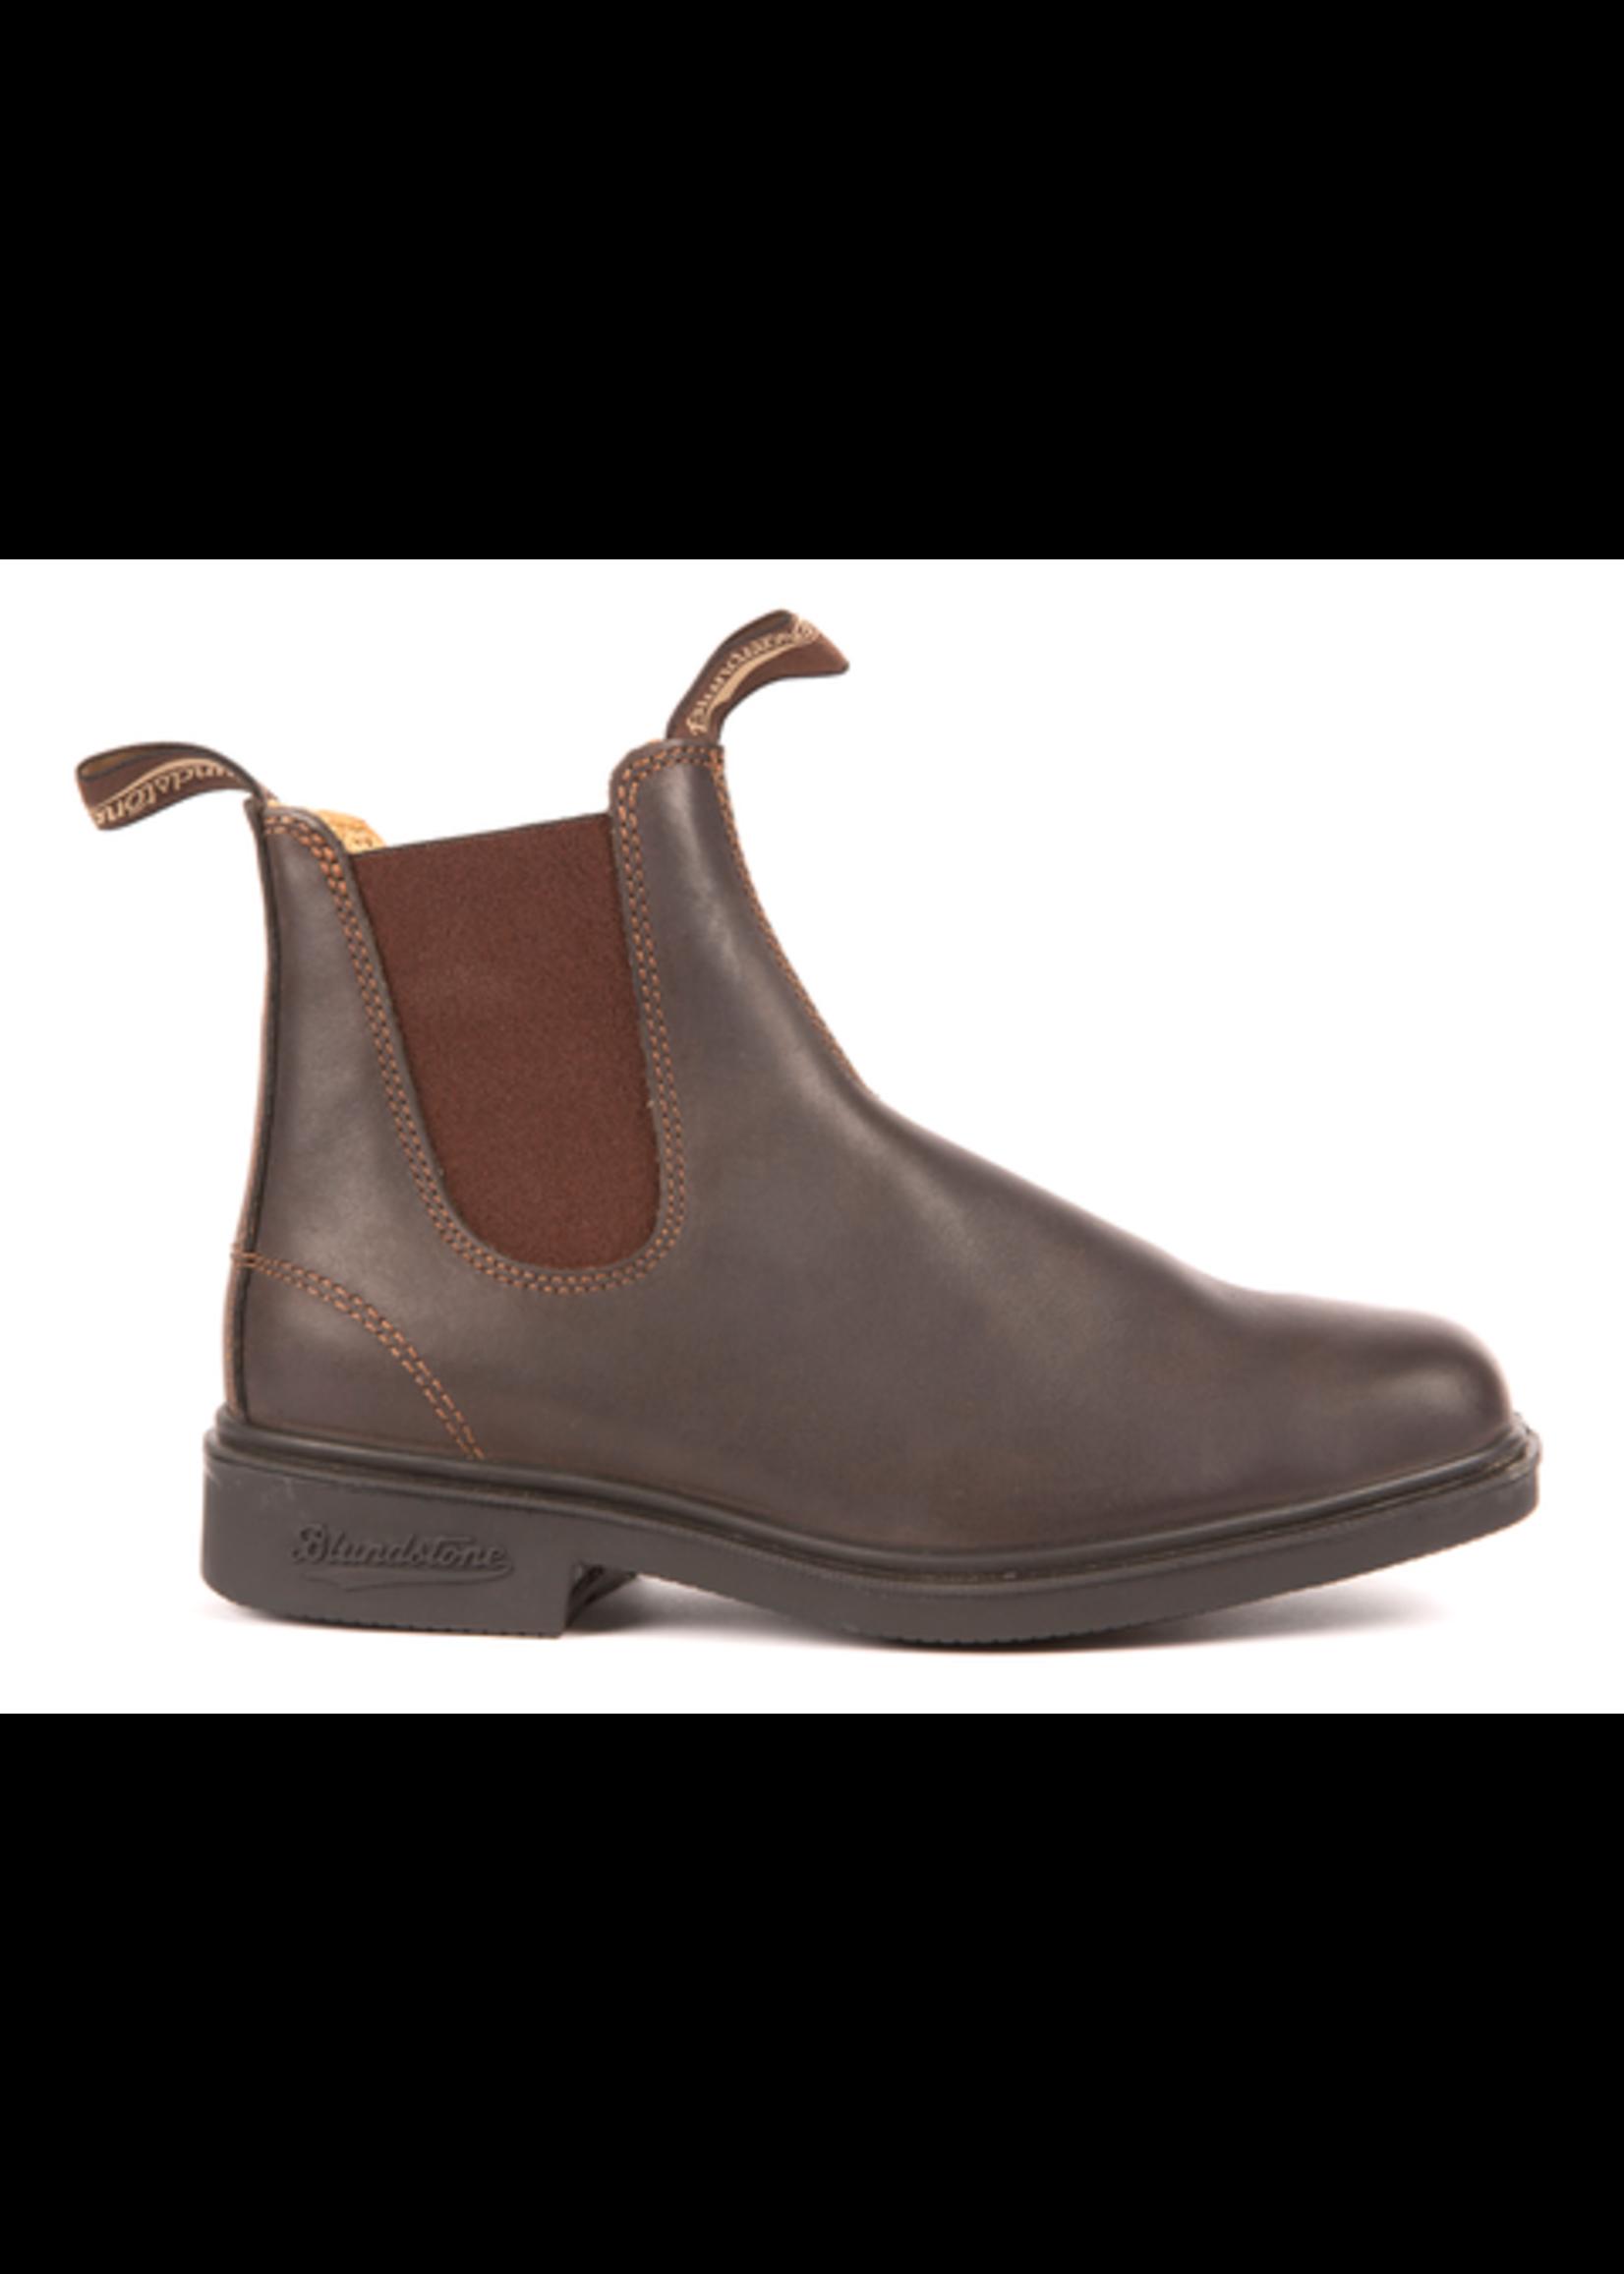 BLUNDSTONE BLUNDSTONE- 067- DRESS- STOUT BROWN